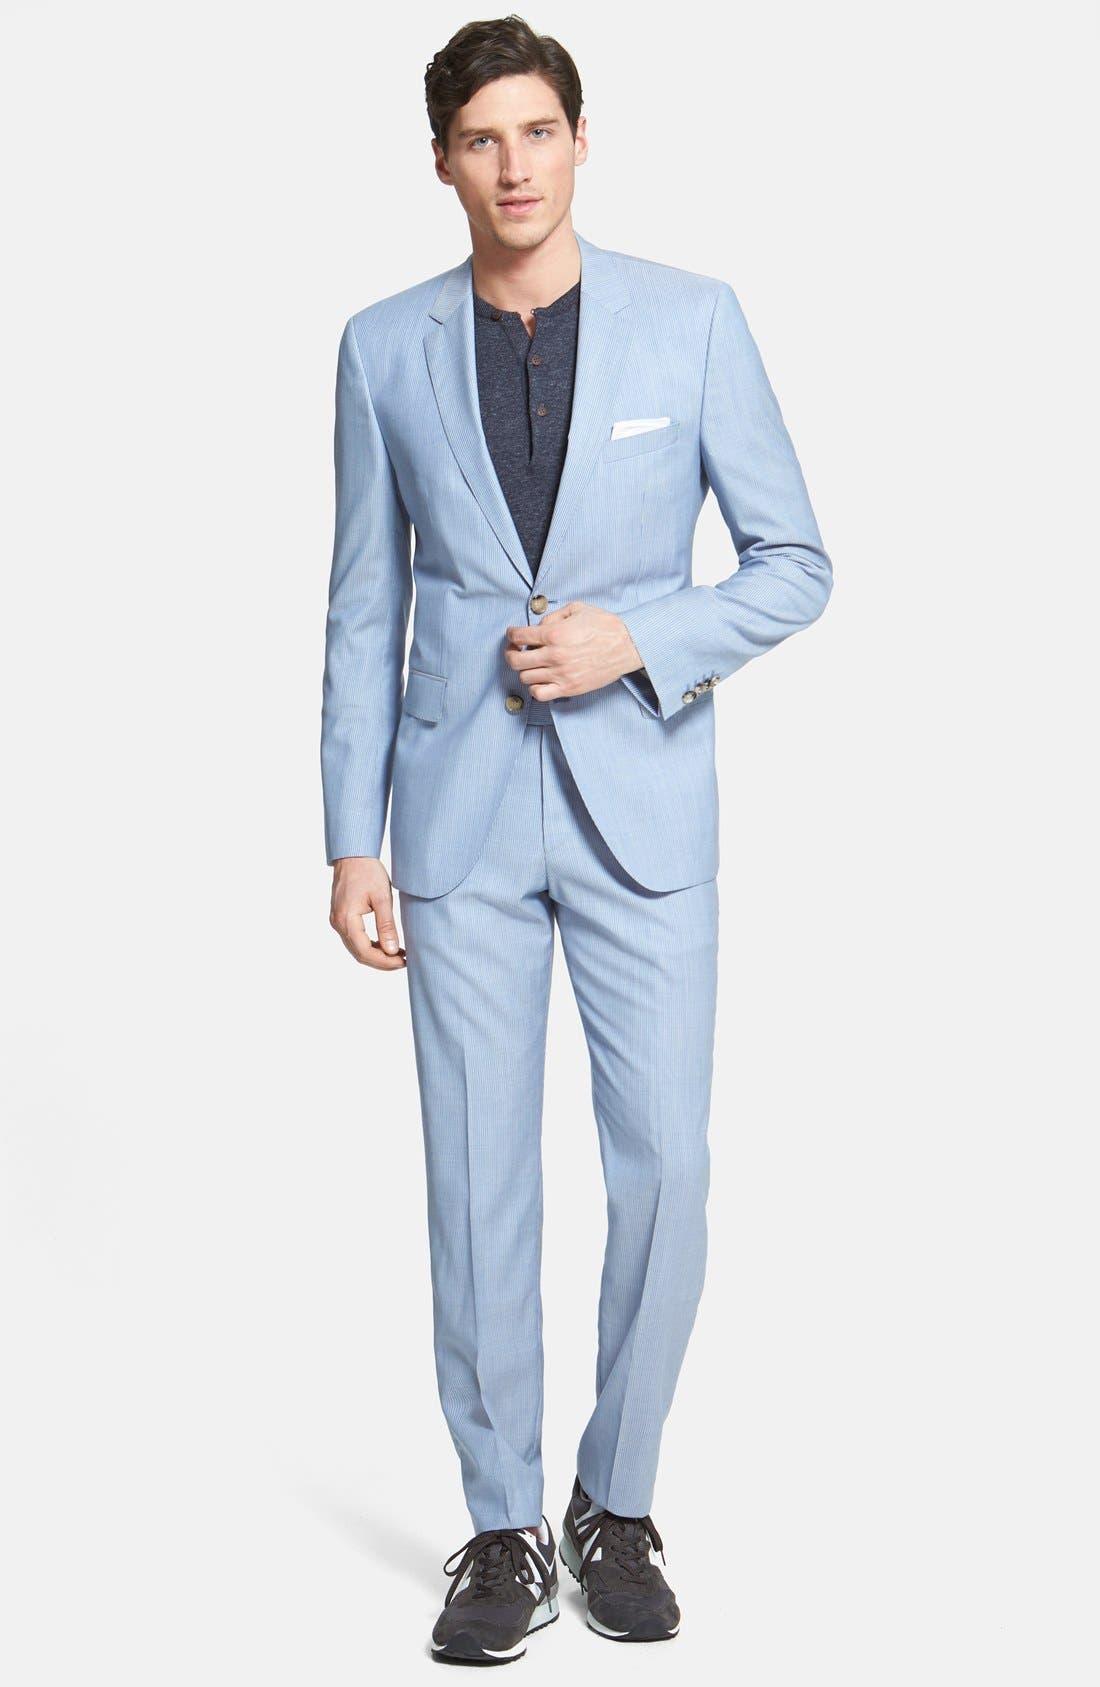 Main Image - BOSS HUGO BOSS 'James/Sharp' Trim Fit Virgin Wool Suit